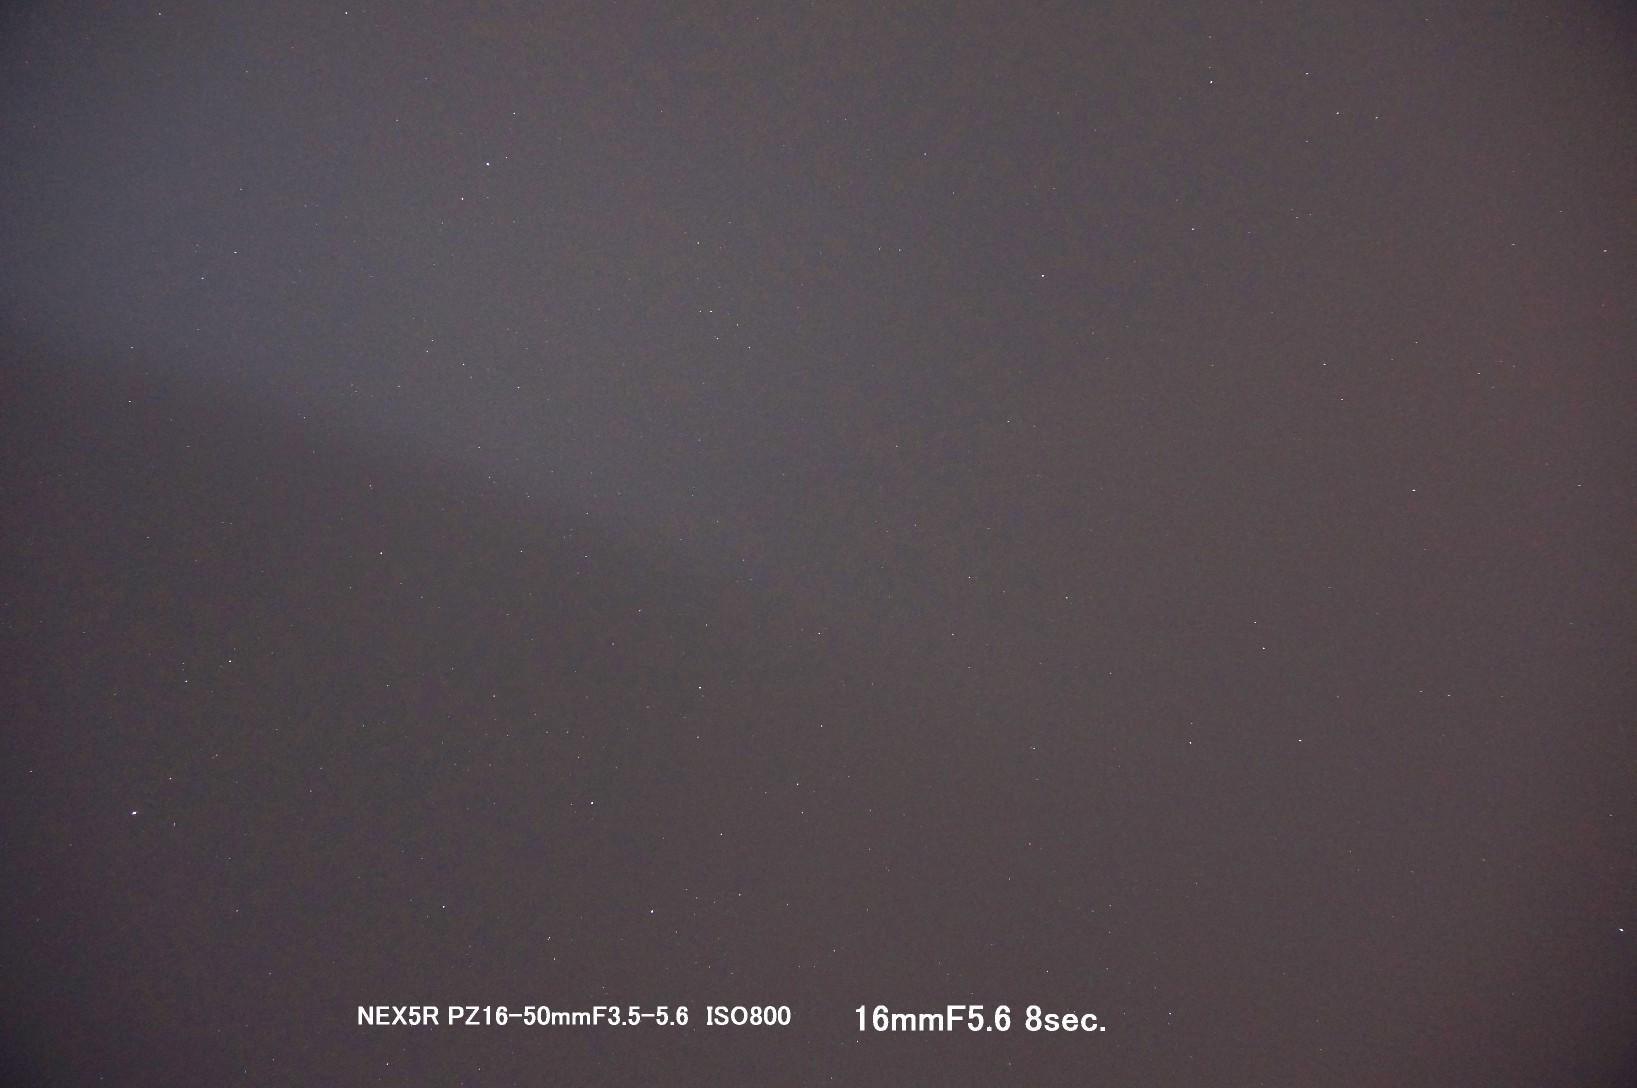 SONY PZ16-50mmF3.5-5.6で夜空を撮ってみた_a0095470_23412854.jpg